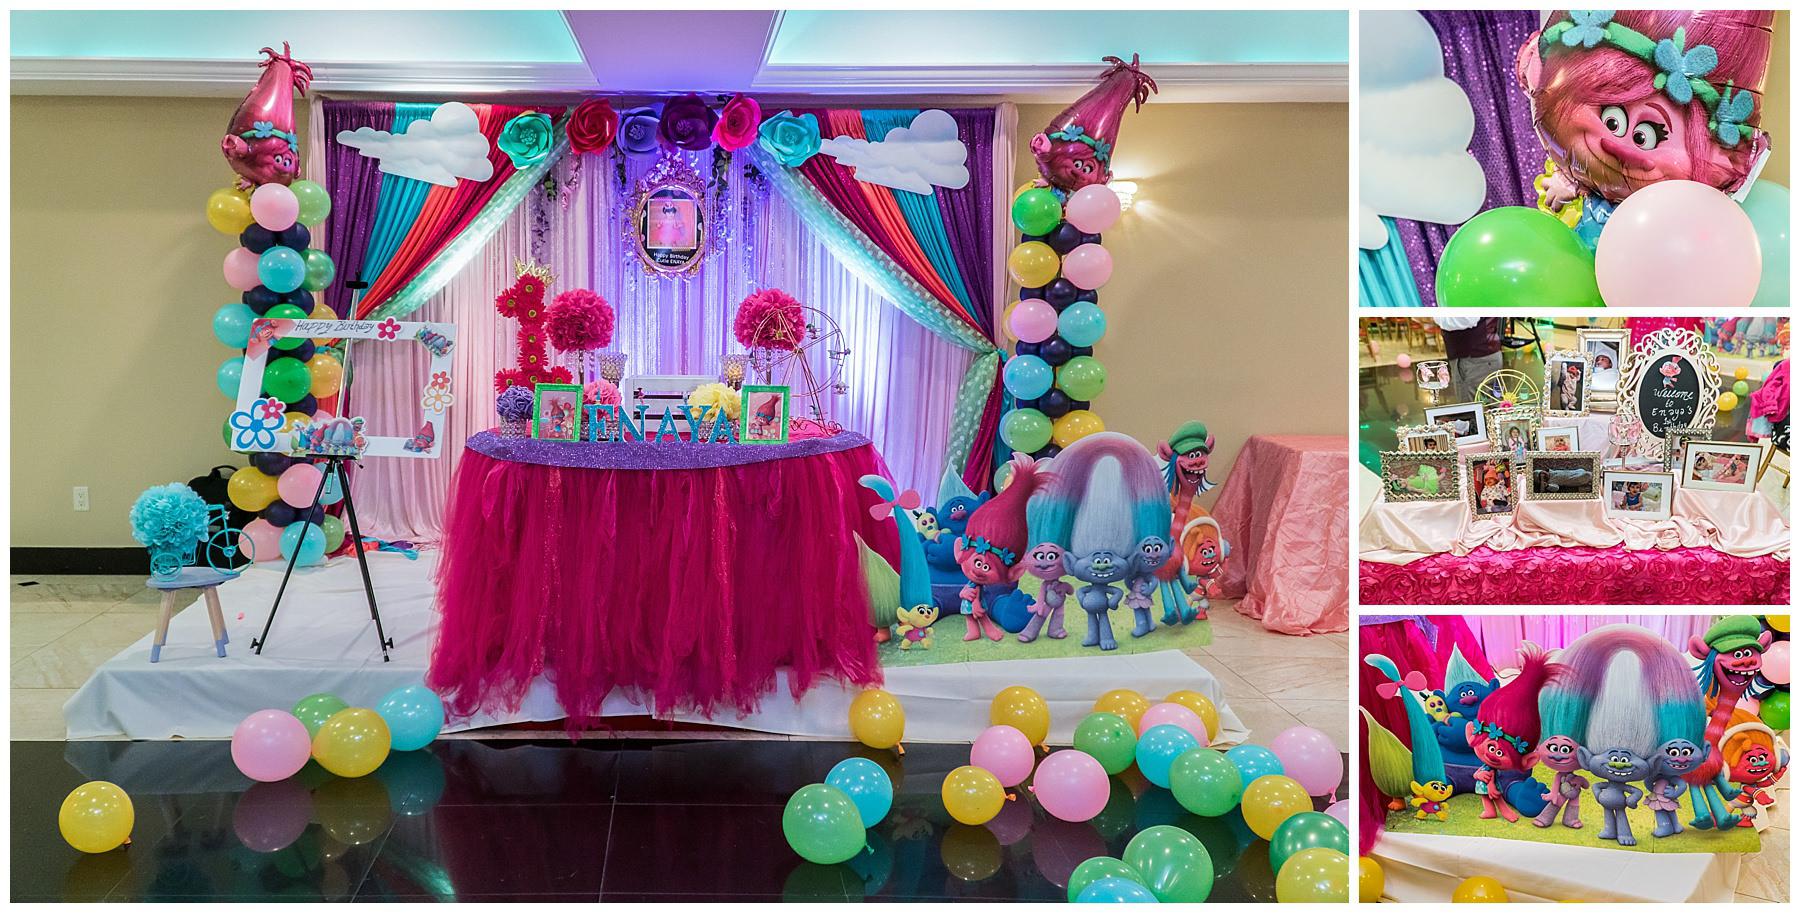 deewan-banquet-piscataway-nj-birthday-enanya-birthday-3.jpg